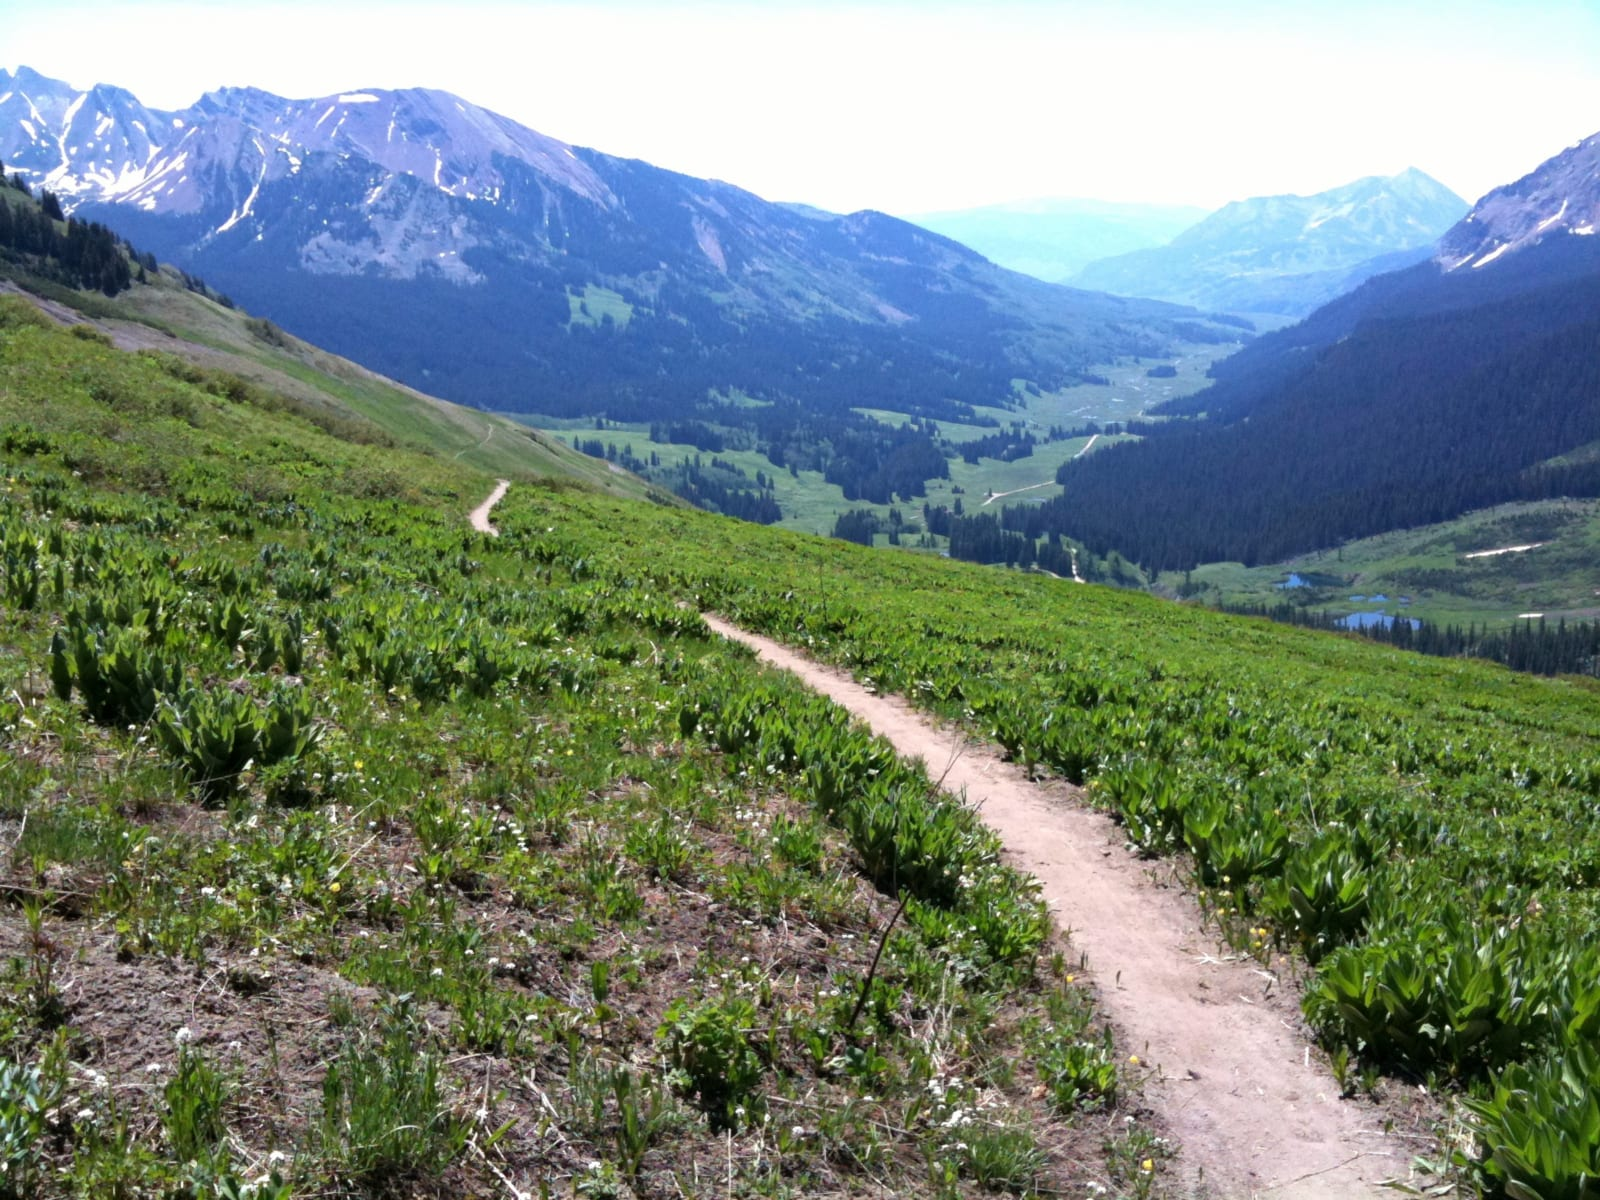 Mountain Biking 401 Singletrack Trail Crested Butte Colorado